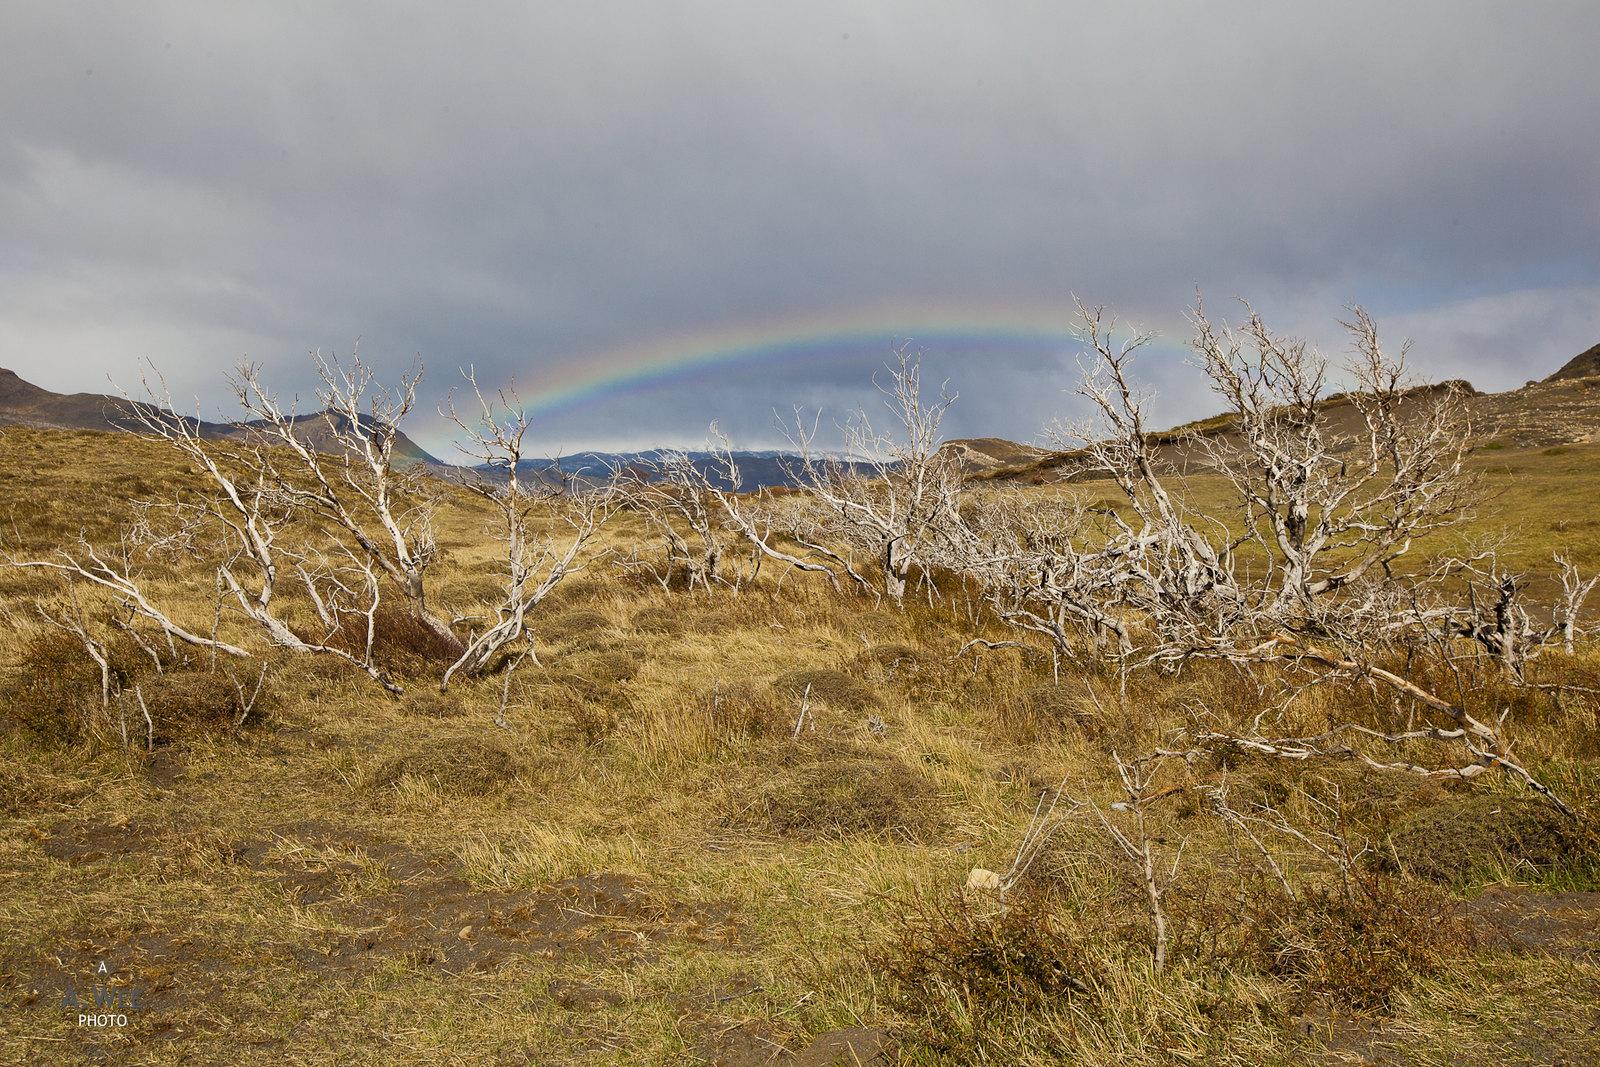 Rainbow in the wild